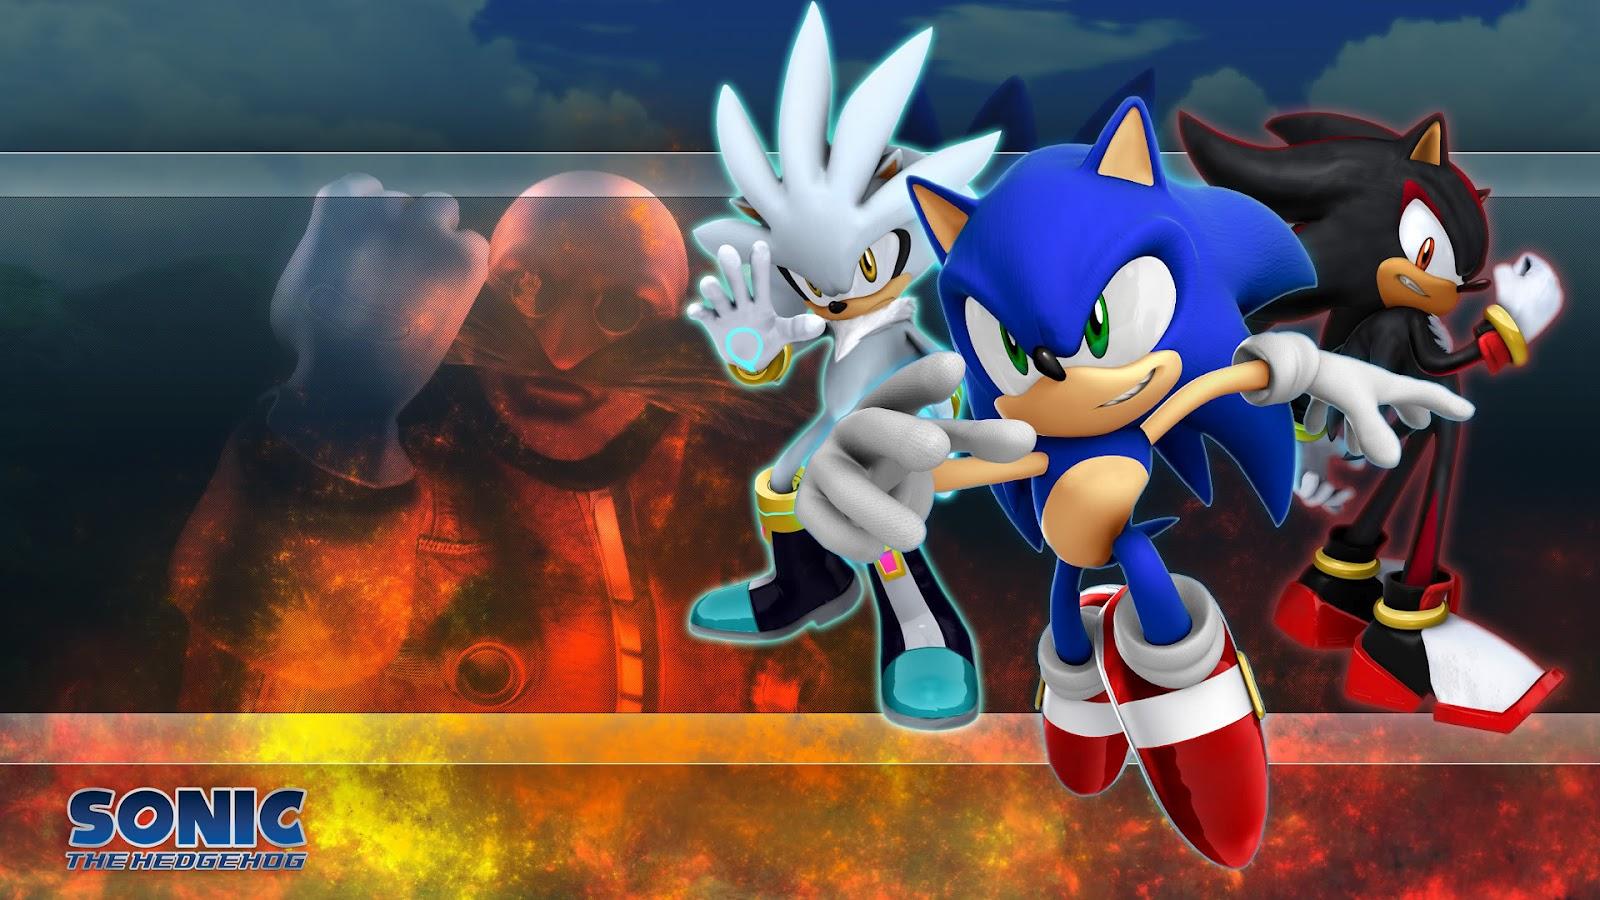 Free Download Sonic The Hedgehog Wallpaper 2 Sonic The Hedgehog